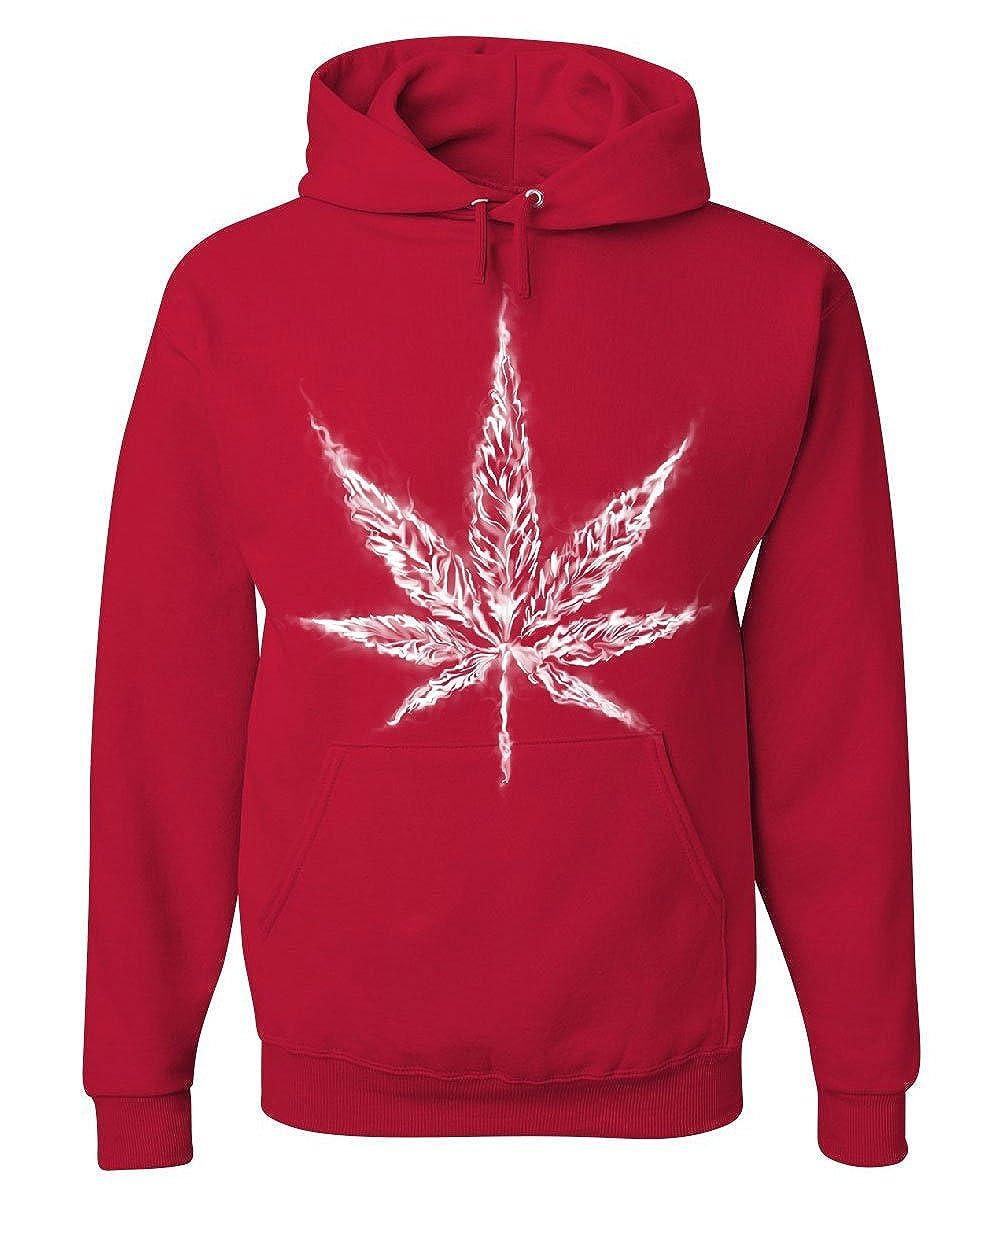 Smoking Pot Leaf Hoodie Smoking Weed 420 Marijuana Cannabis Sweatshirt 100157-S